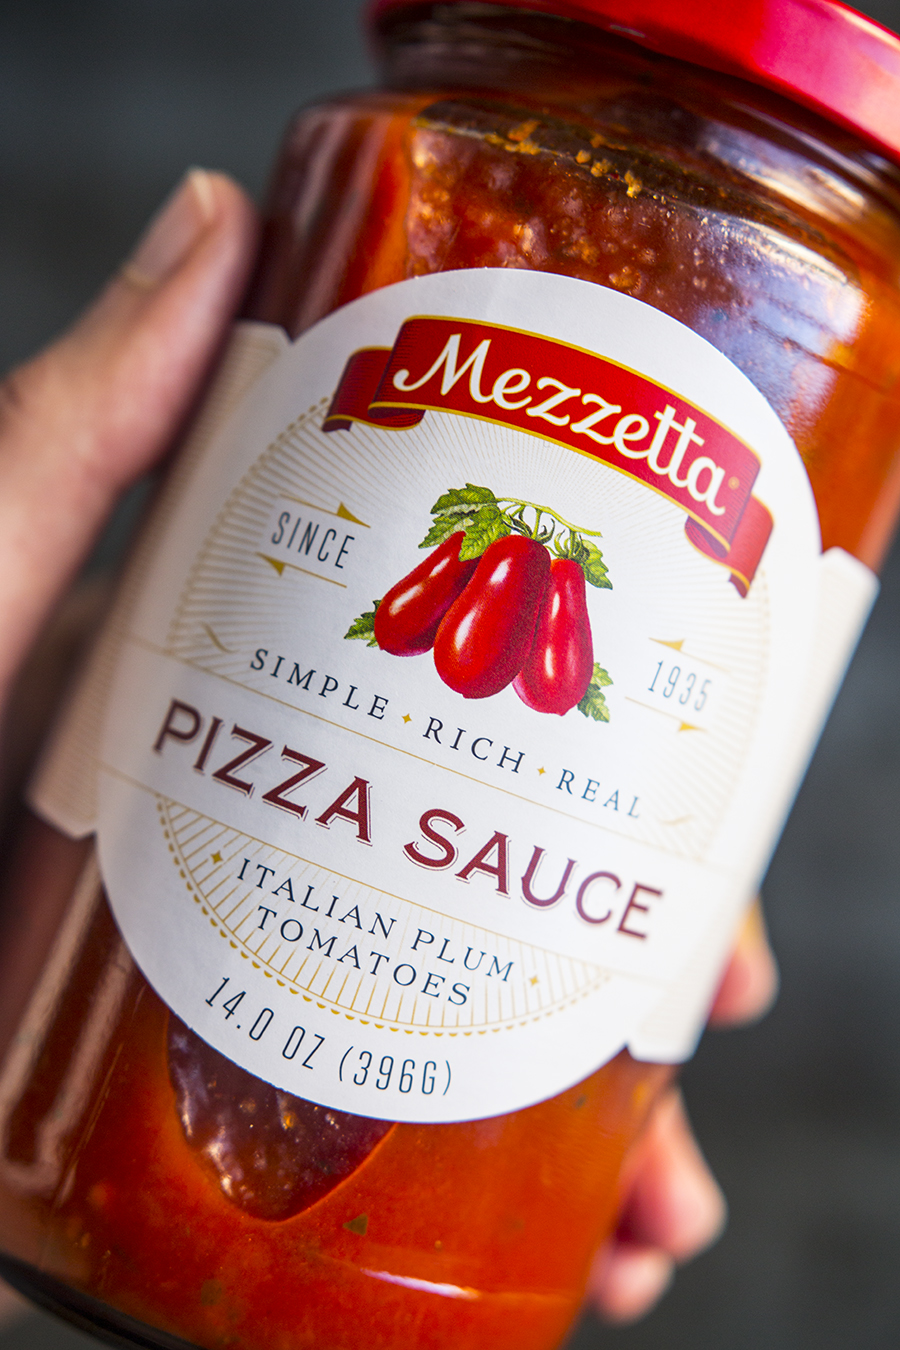 Mezzetta Pizza Sauce (sugar-free)